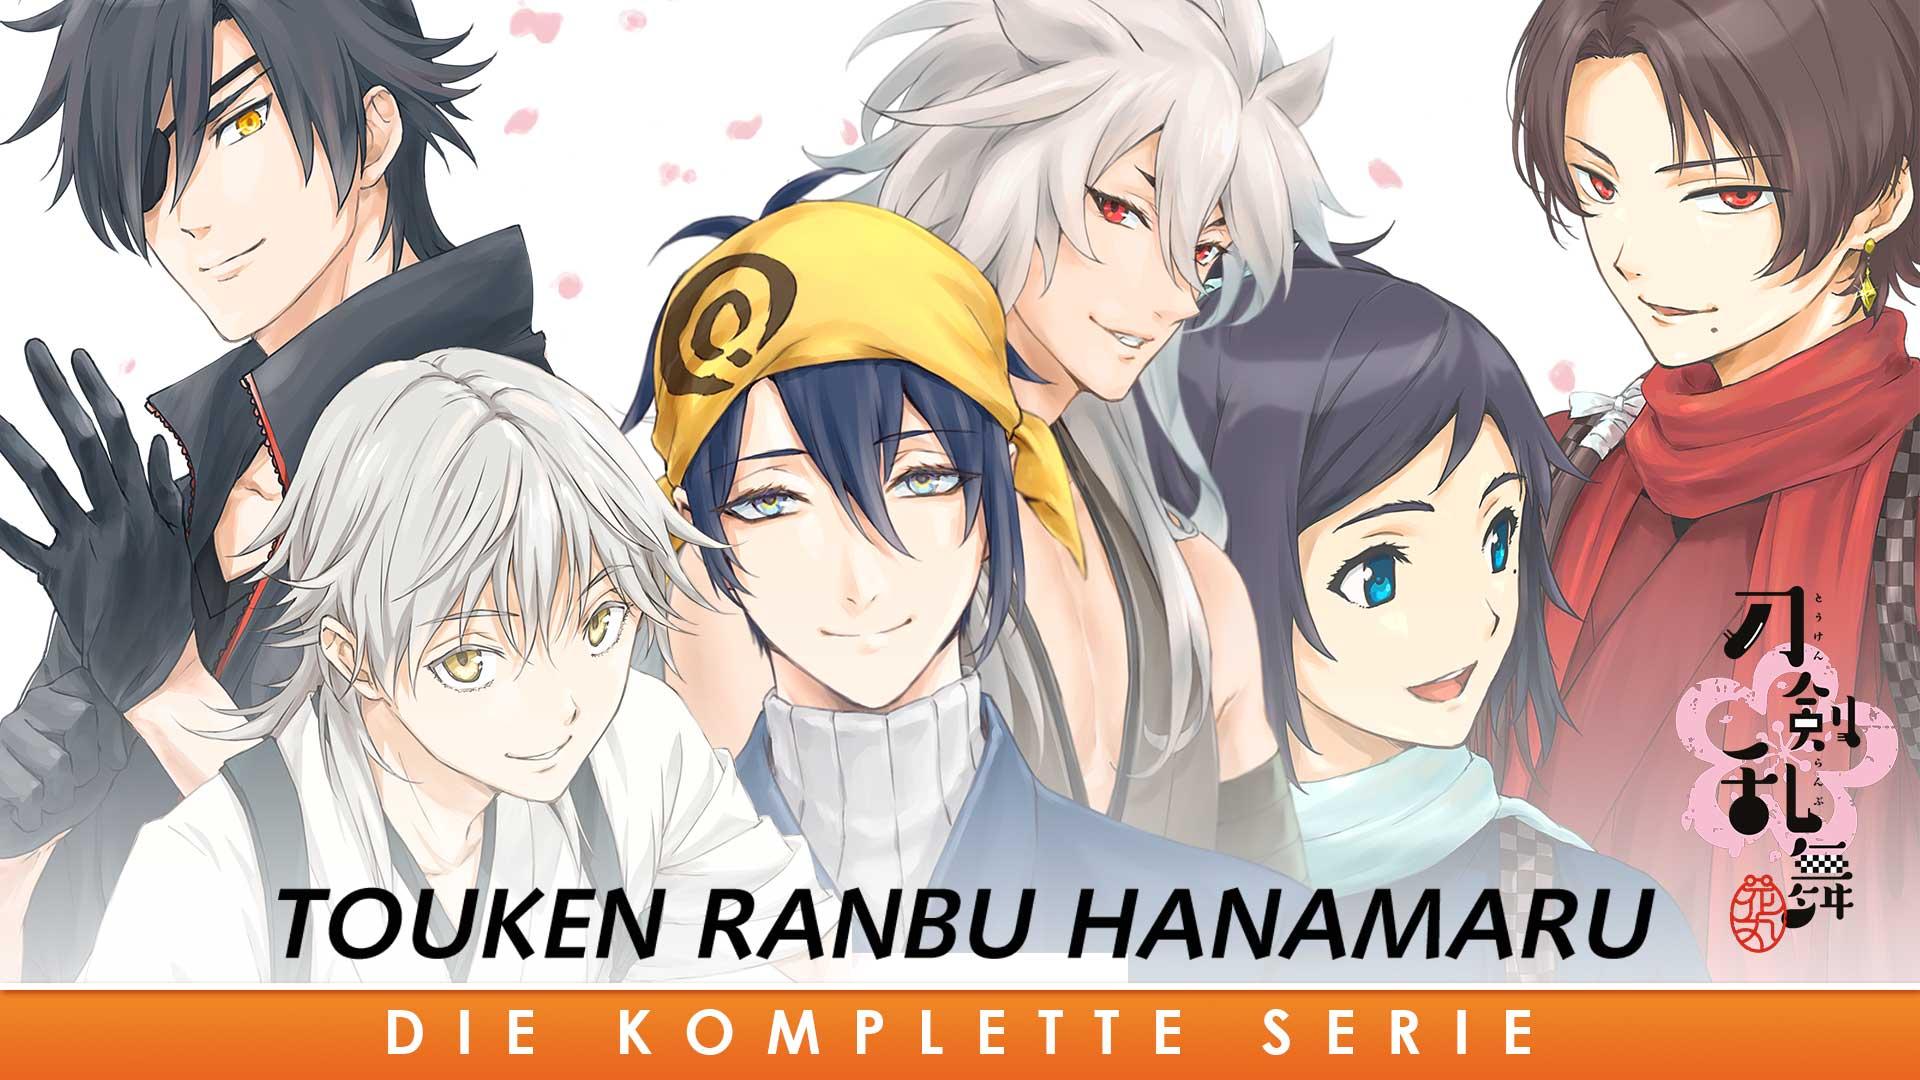 Touken Ranbu Hanamaru - Die komplette Serie